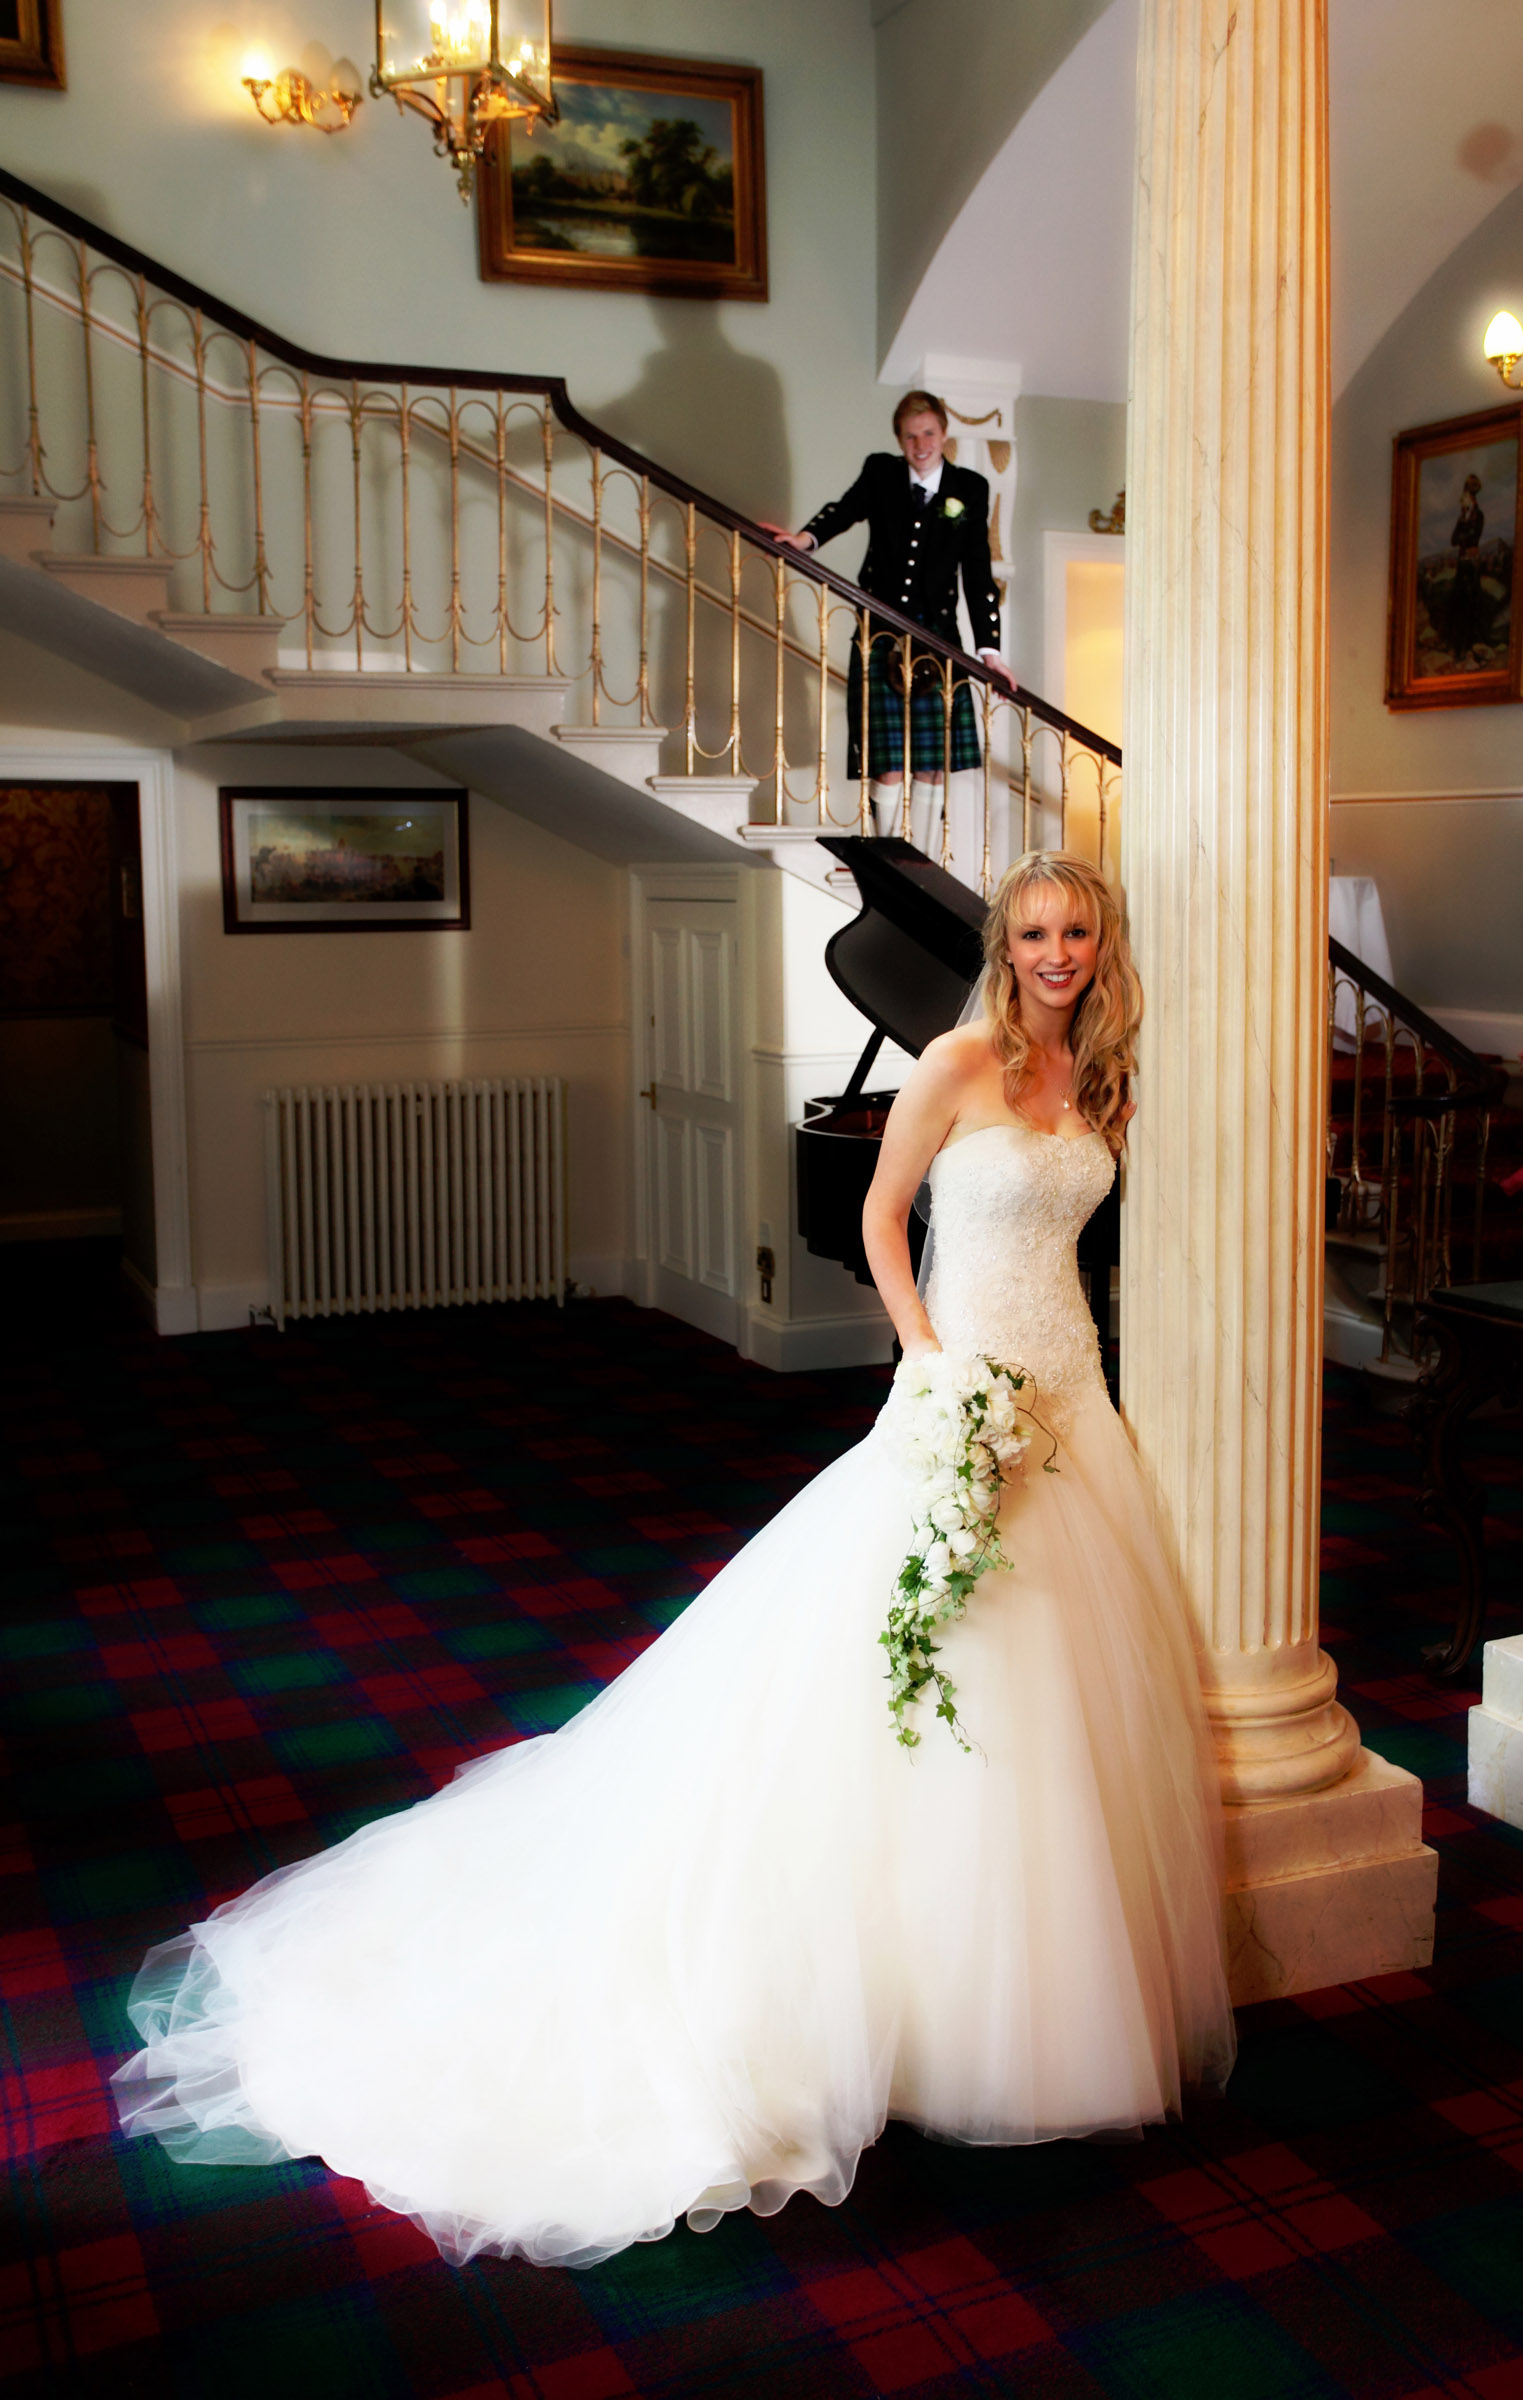 Classic_award_winning_wedding_photograph.jpg